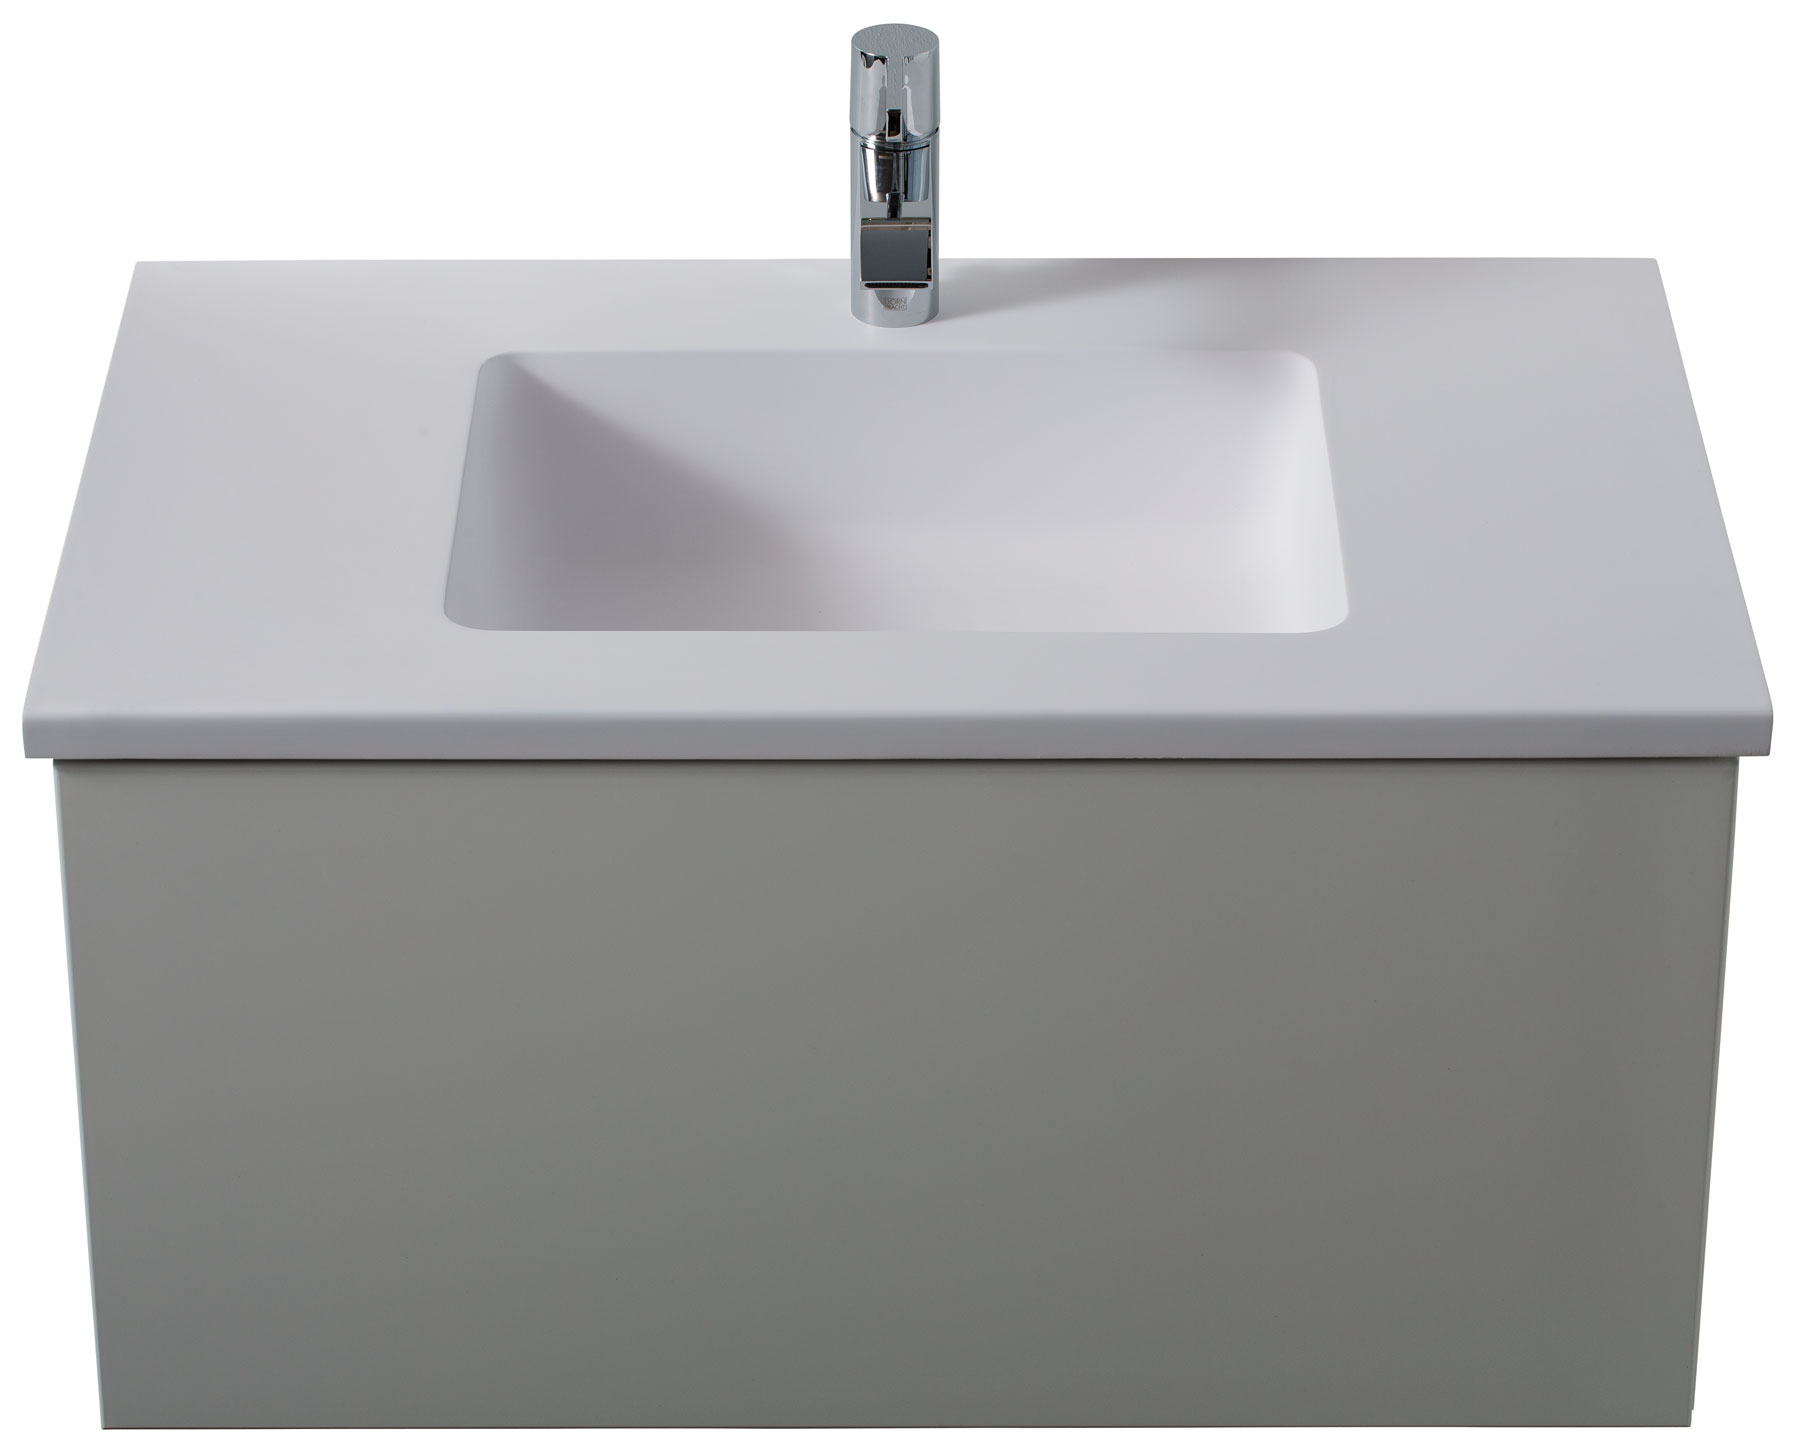 Carta-Hvid-Marmor-prisliste1800.jpg